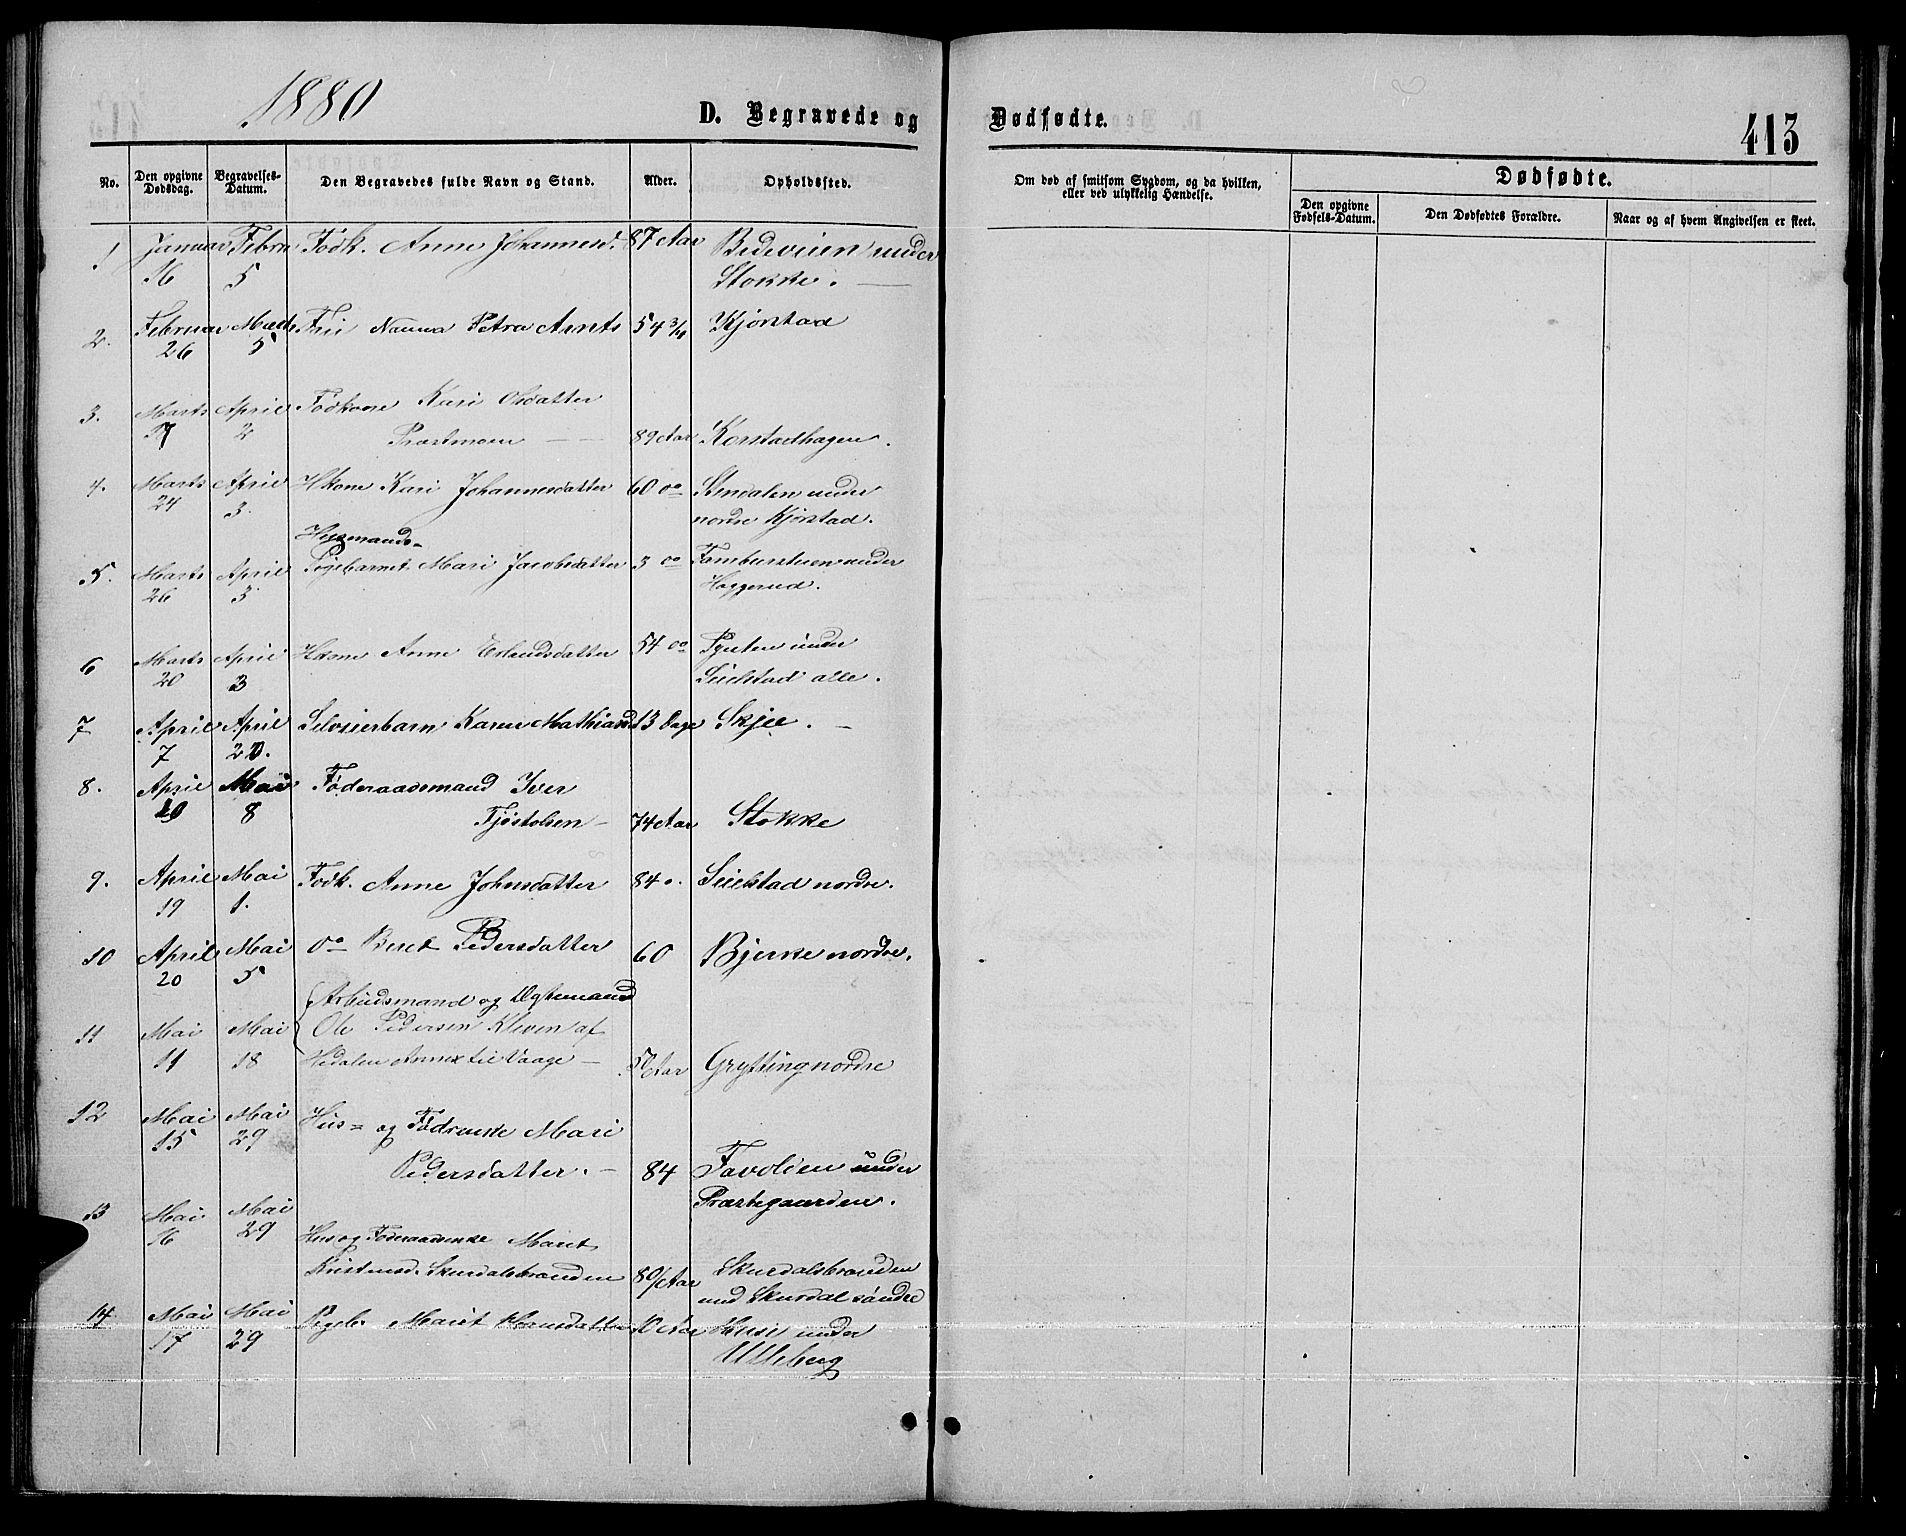 SAH, Sør-Fron prestekontor, H/Ha/Hab/L0002: Klokkerbok nr. 2, 1864-1883, s. 413